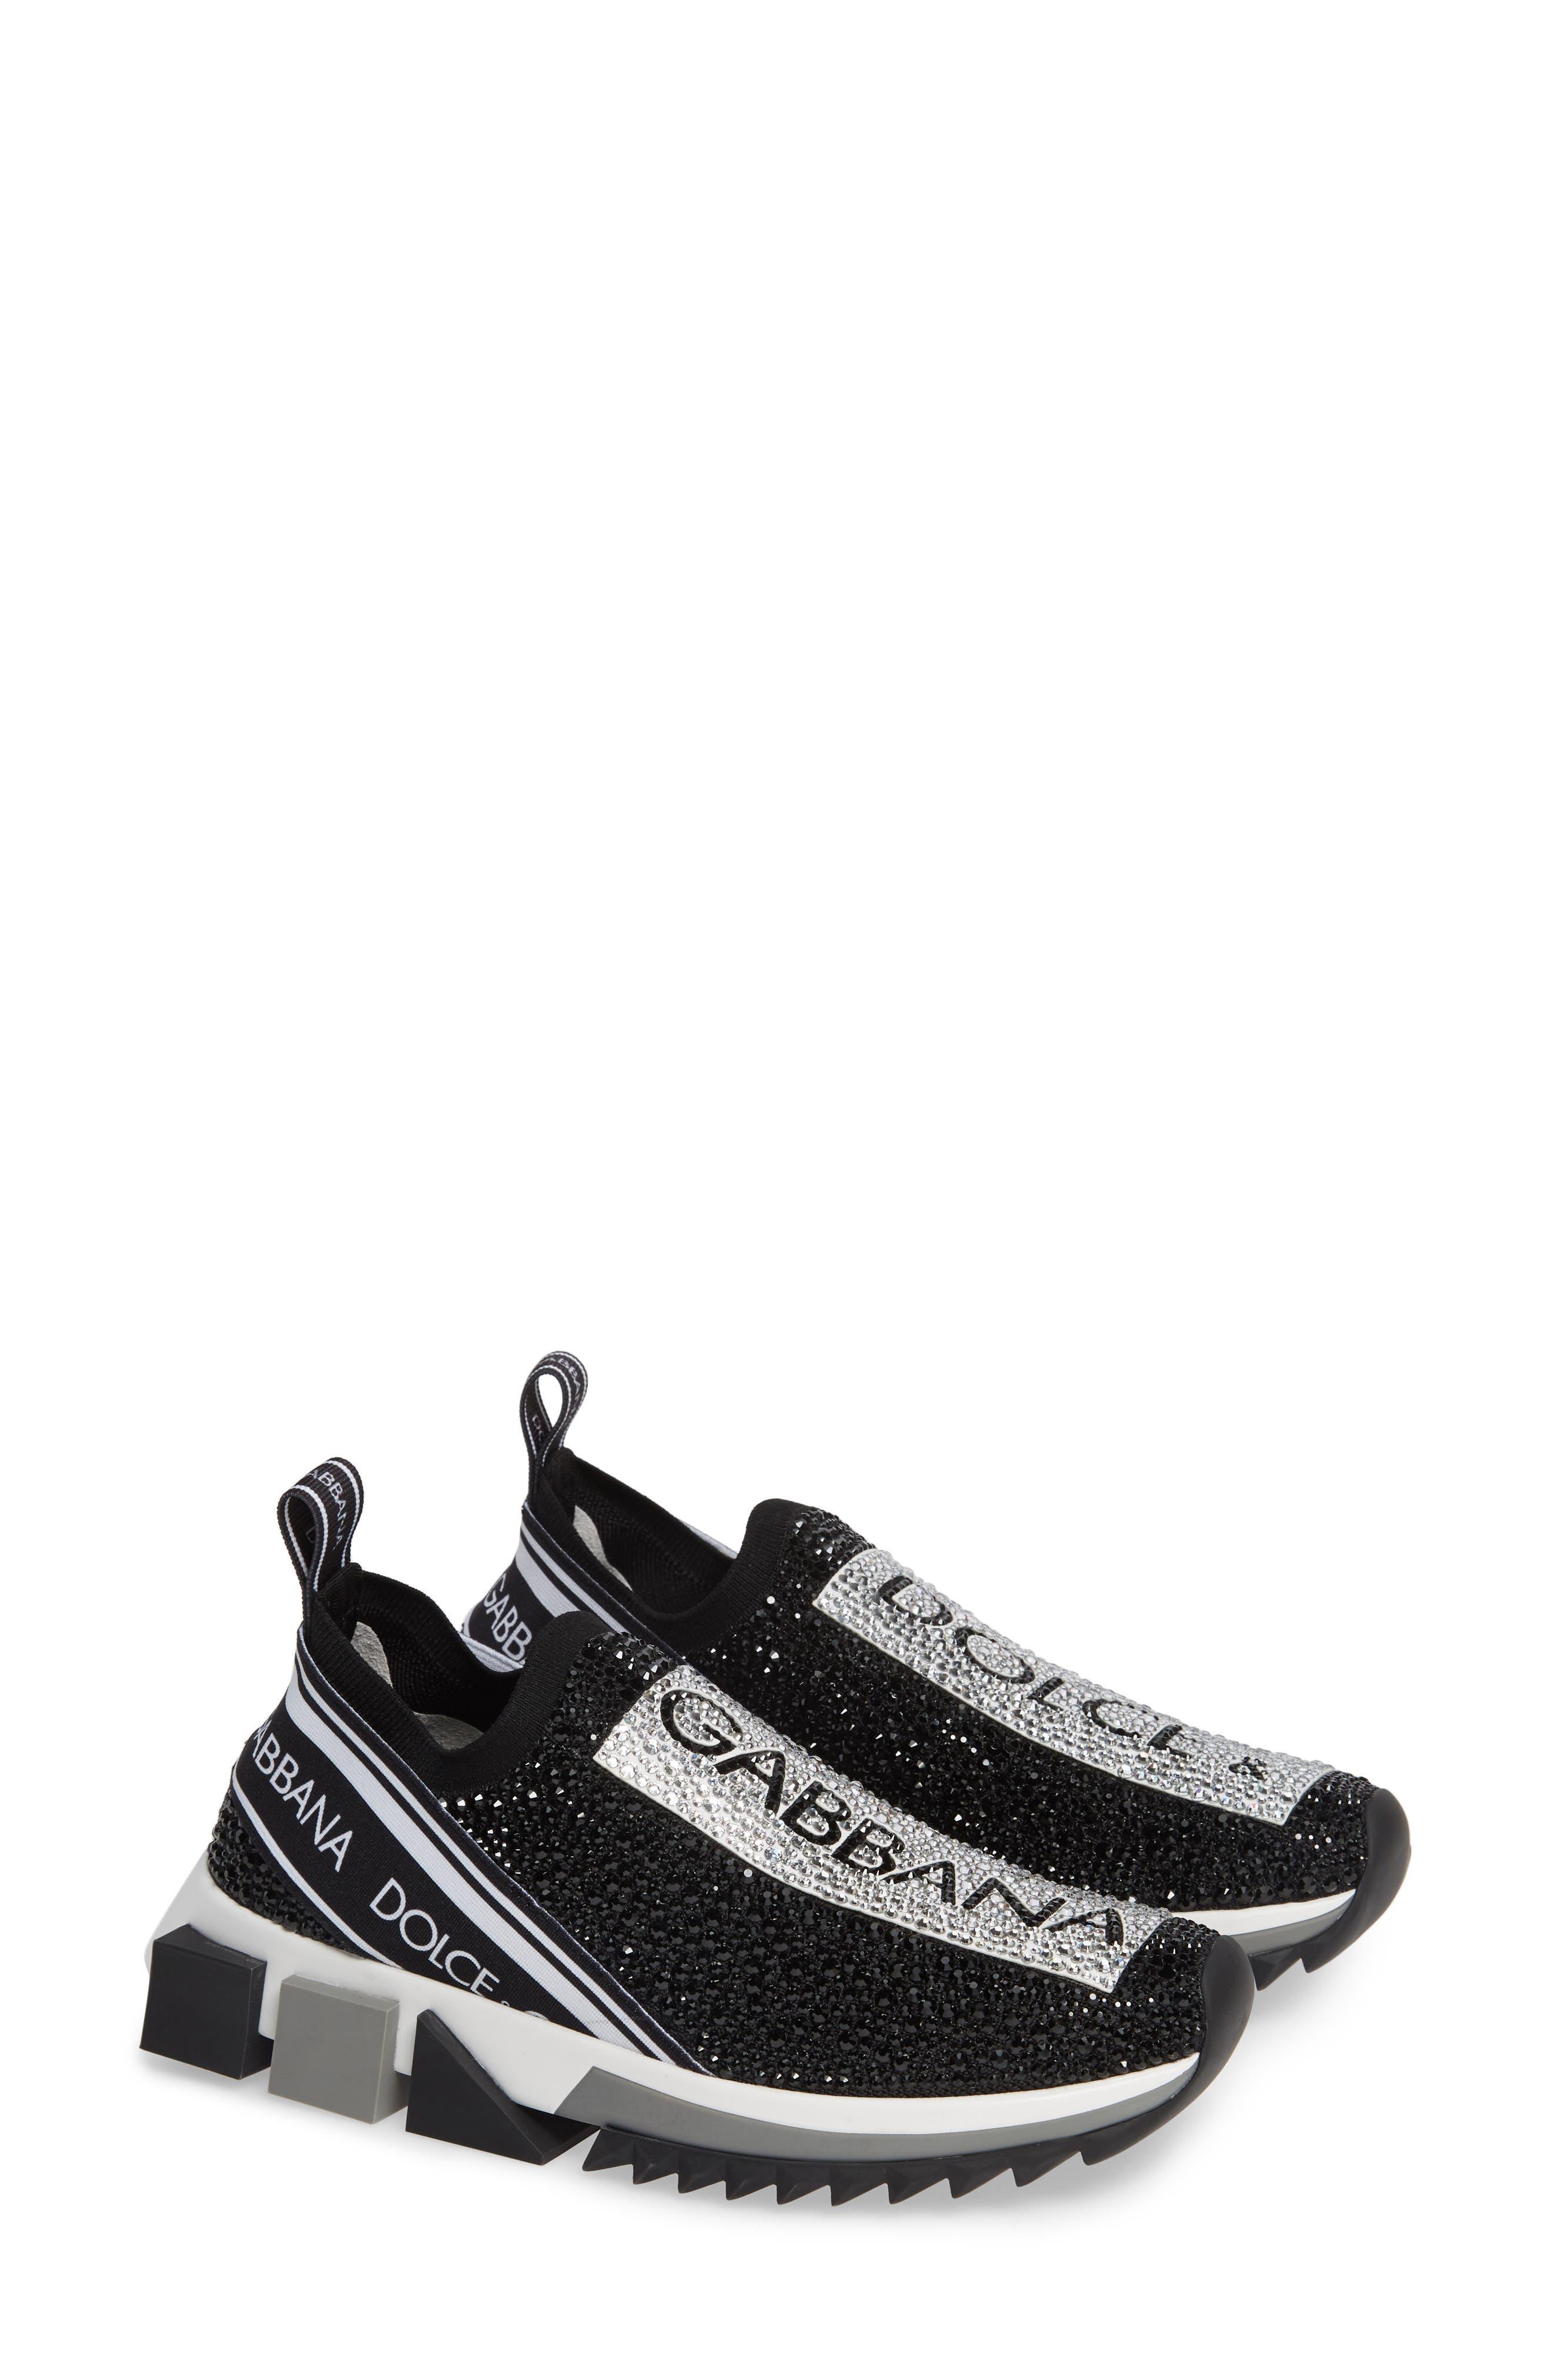 DOLCE&GABBANA, Sorrento Jeweled Logo Sneaker, Alternate thumbnail 2, color, 040